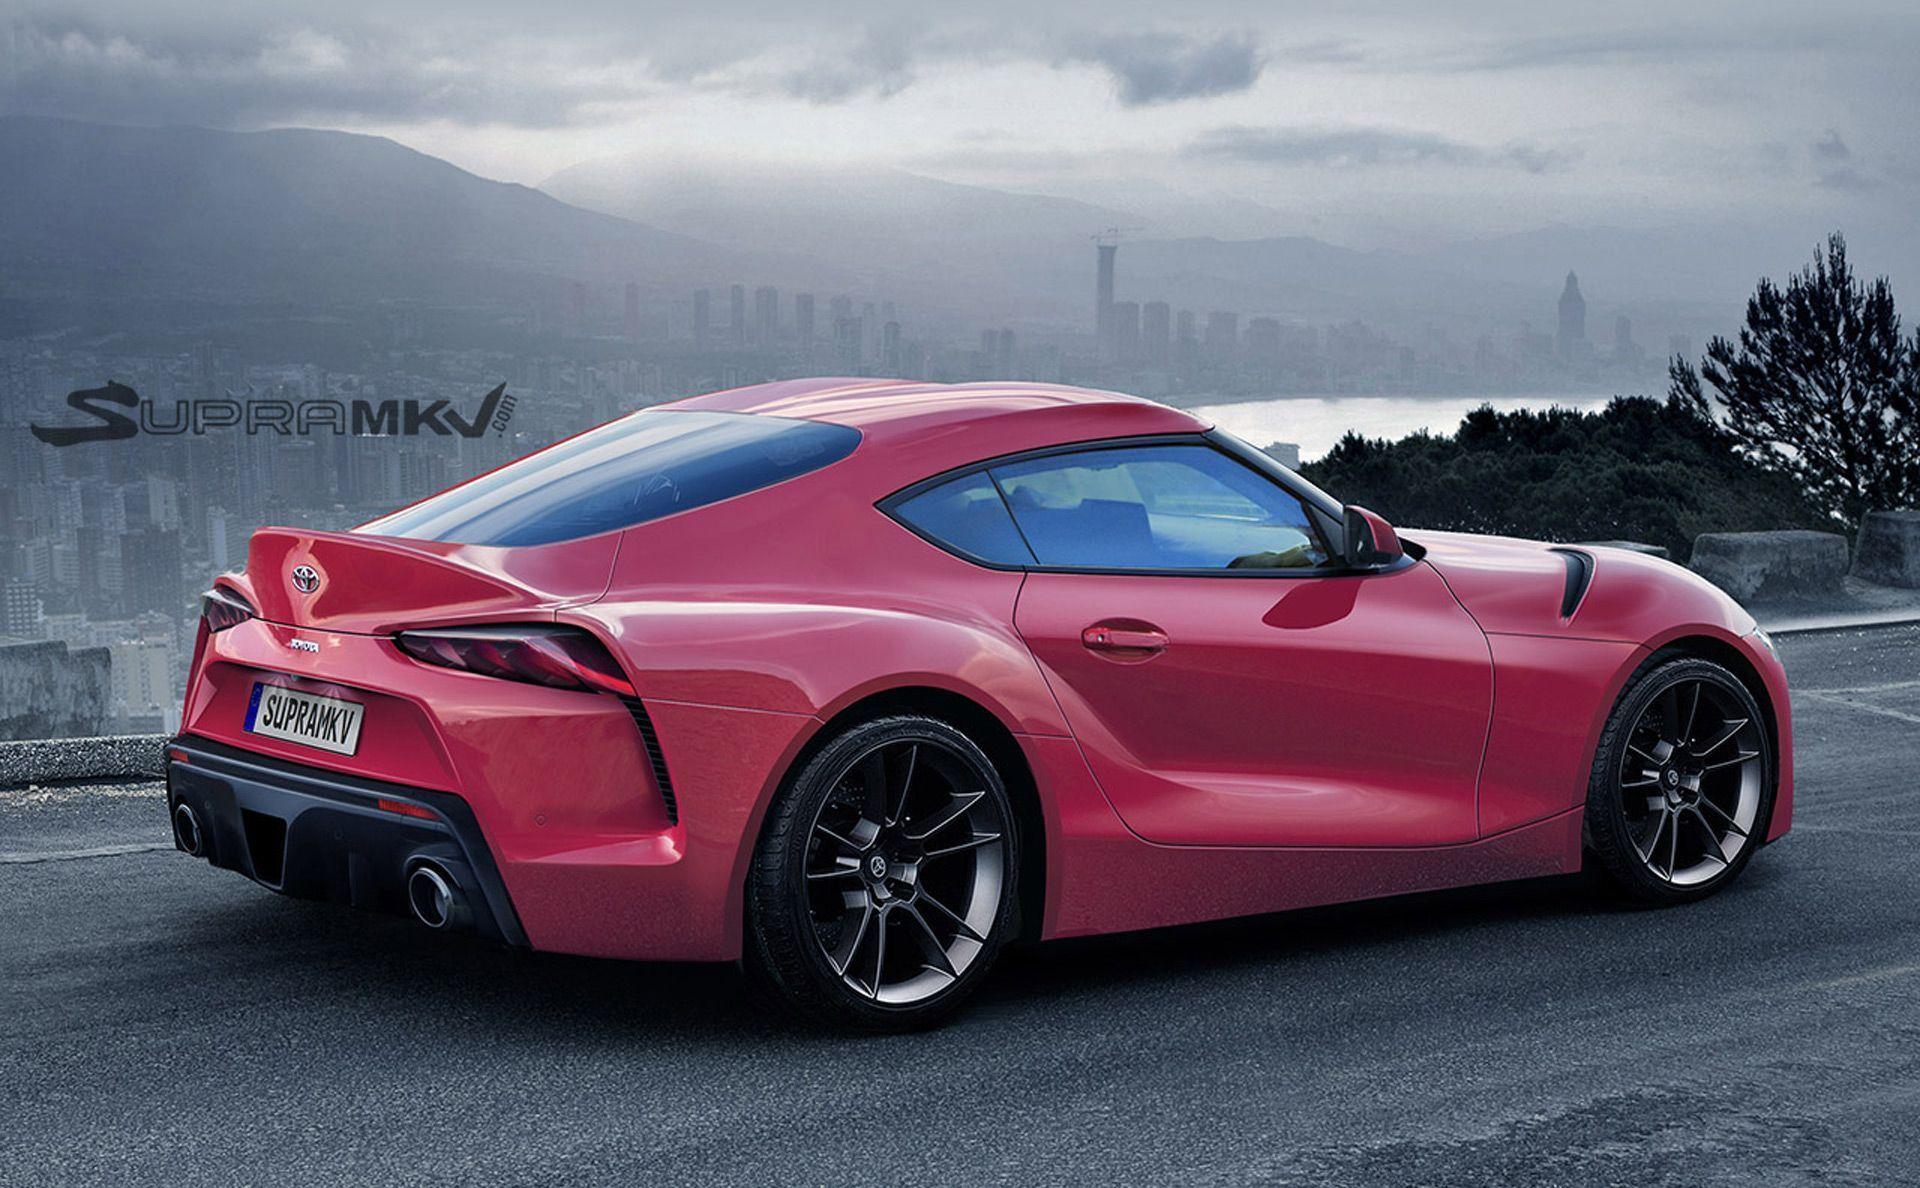 Kelebihan Kekurangan Celica 2019 Top Model Tahun Ini